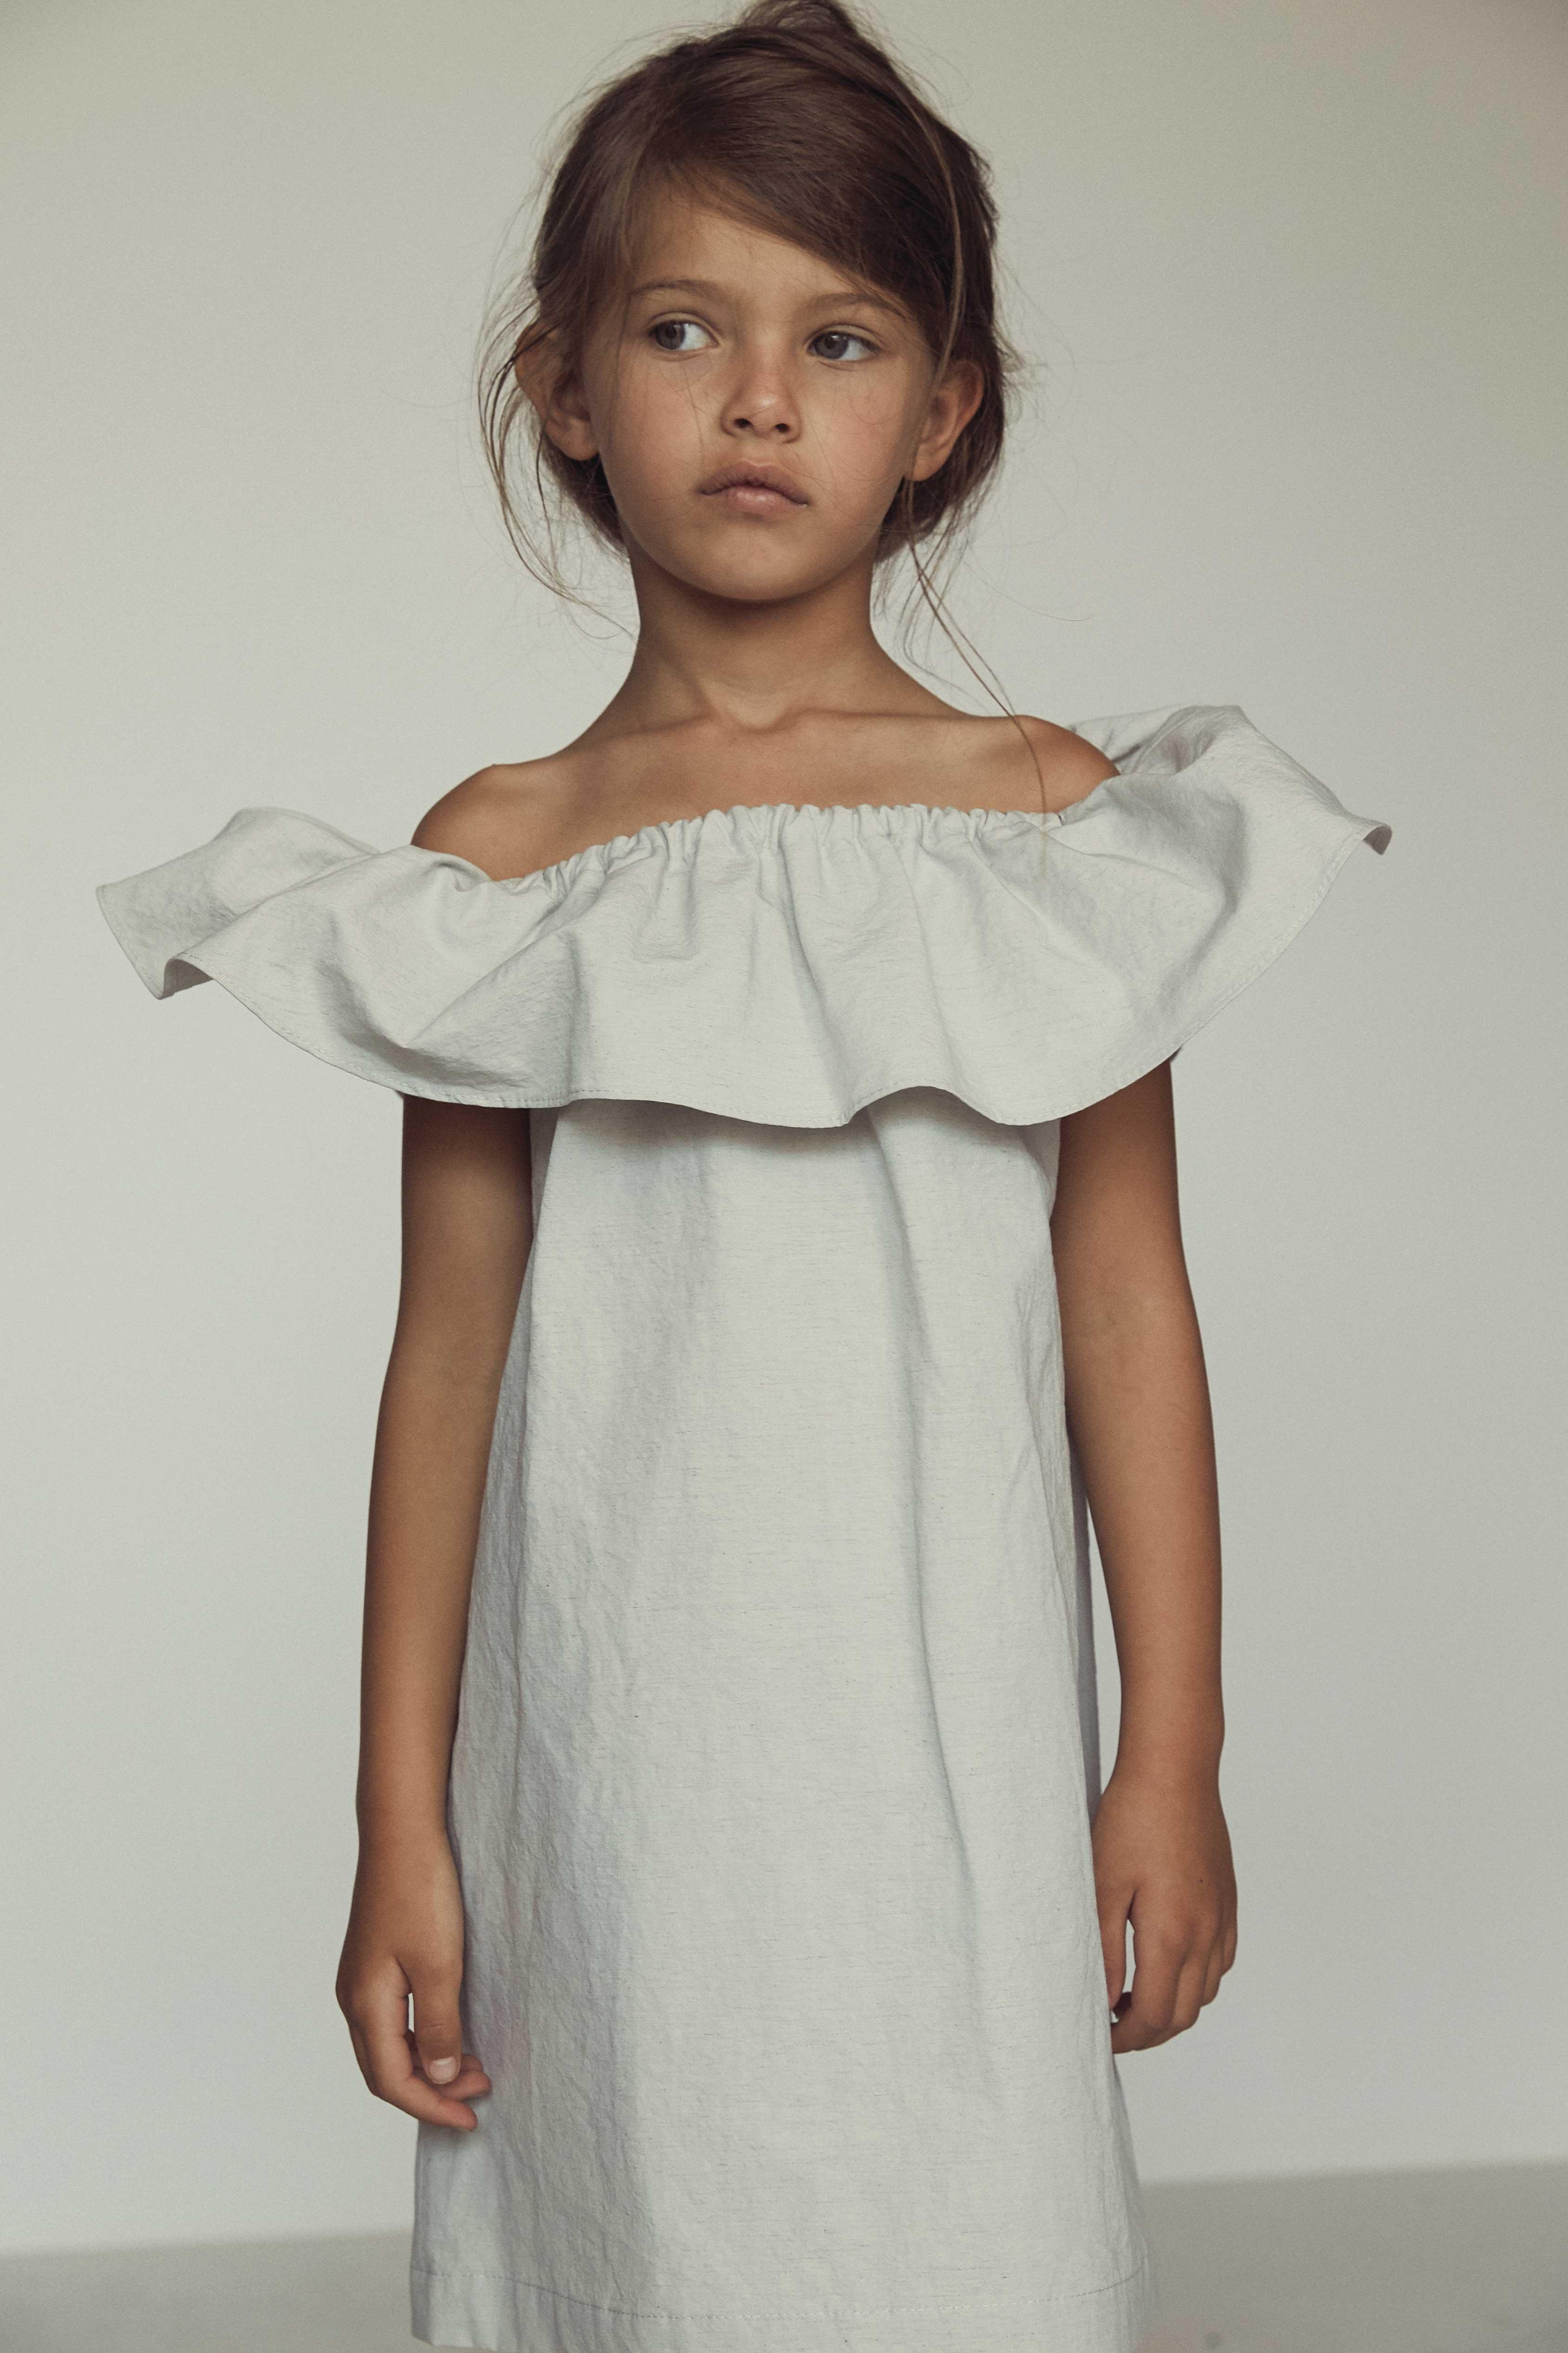 Kids fashion show dresses